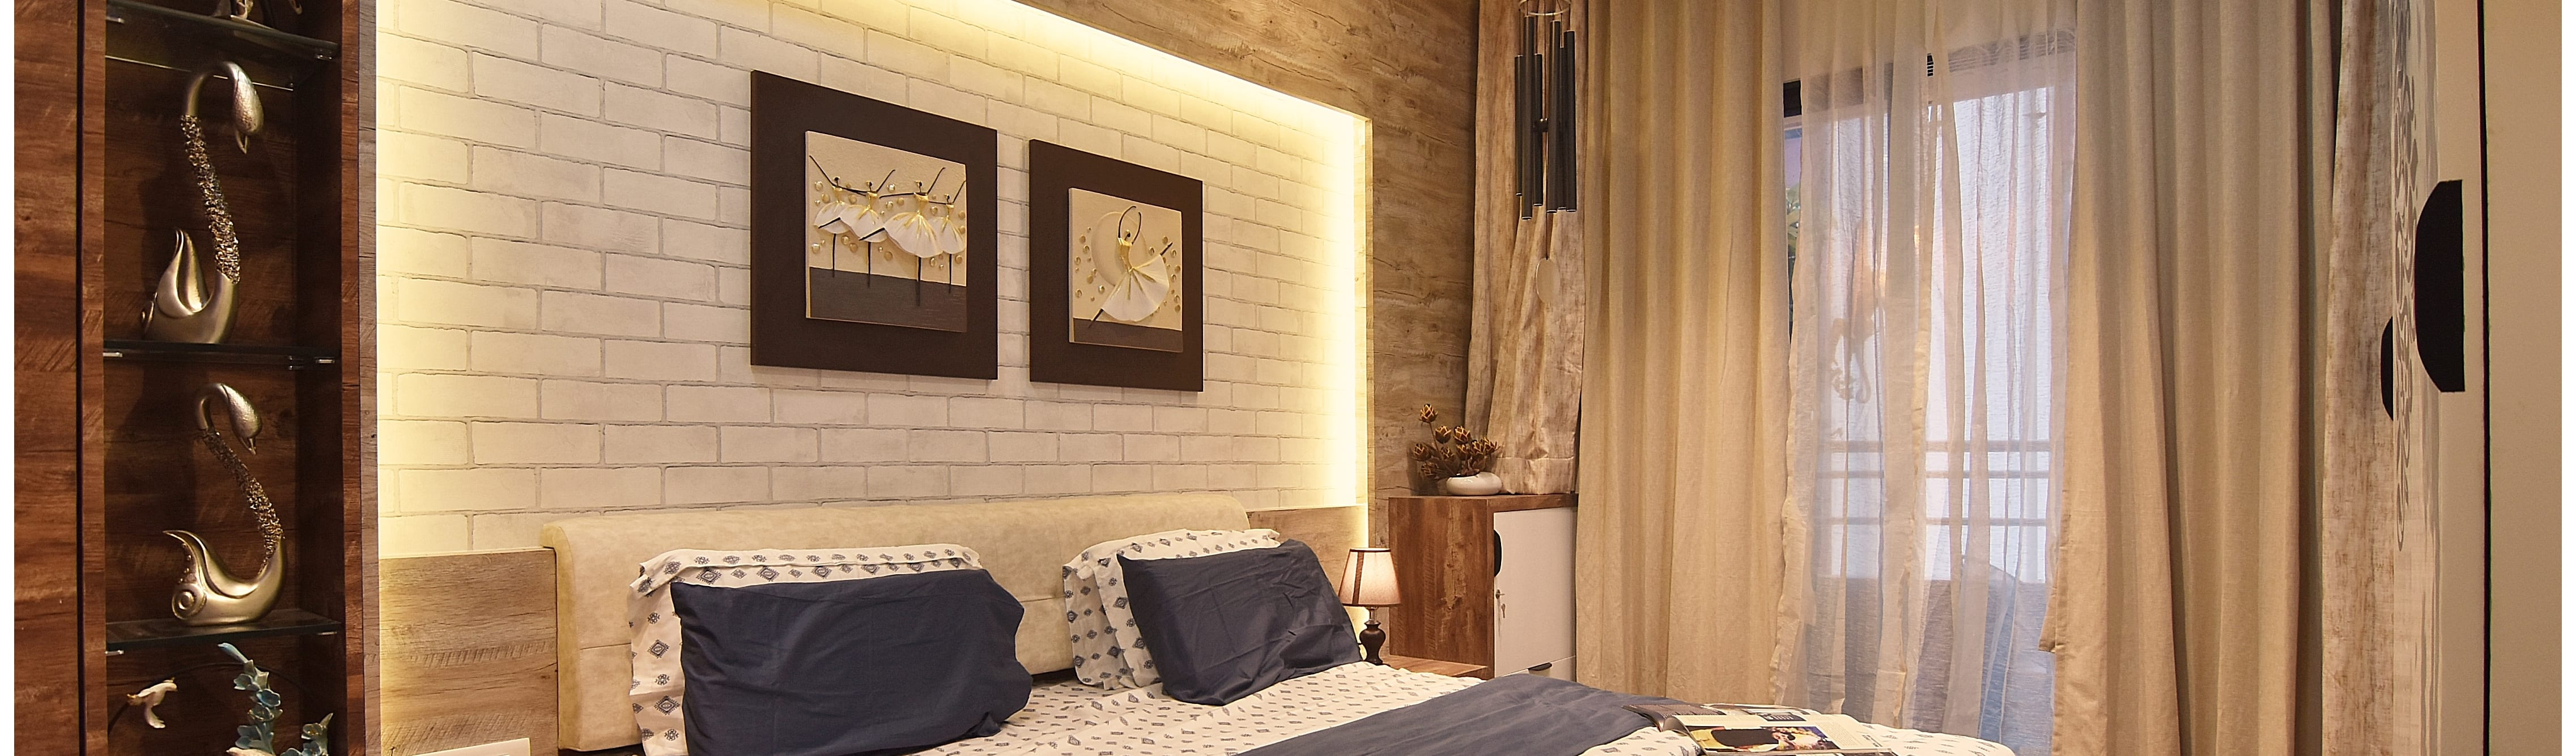 Shubhchintan Design possibilities